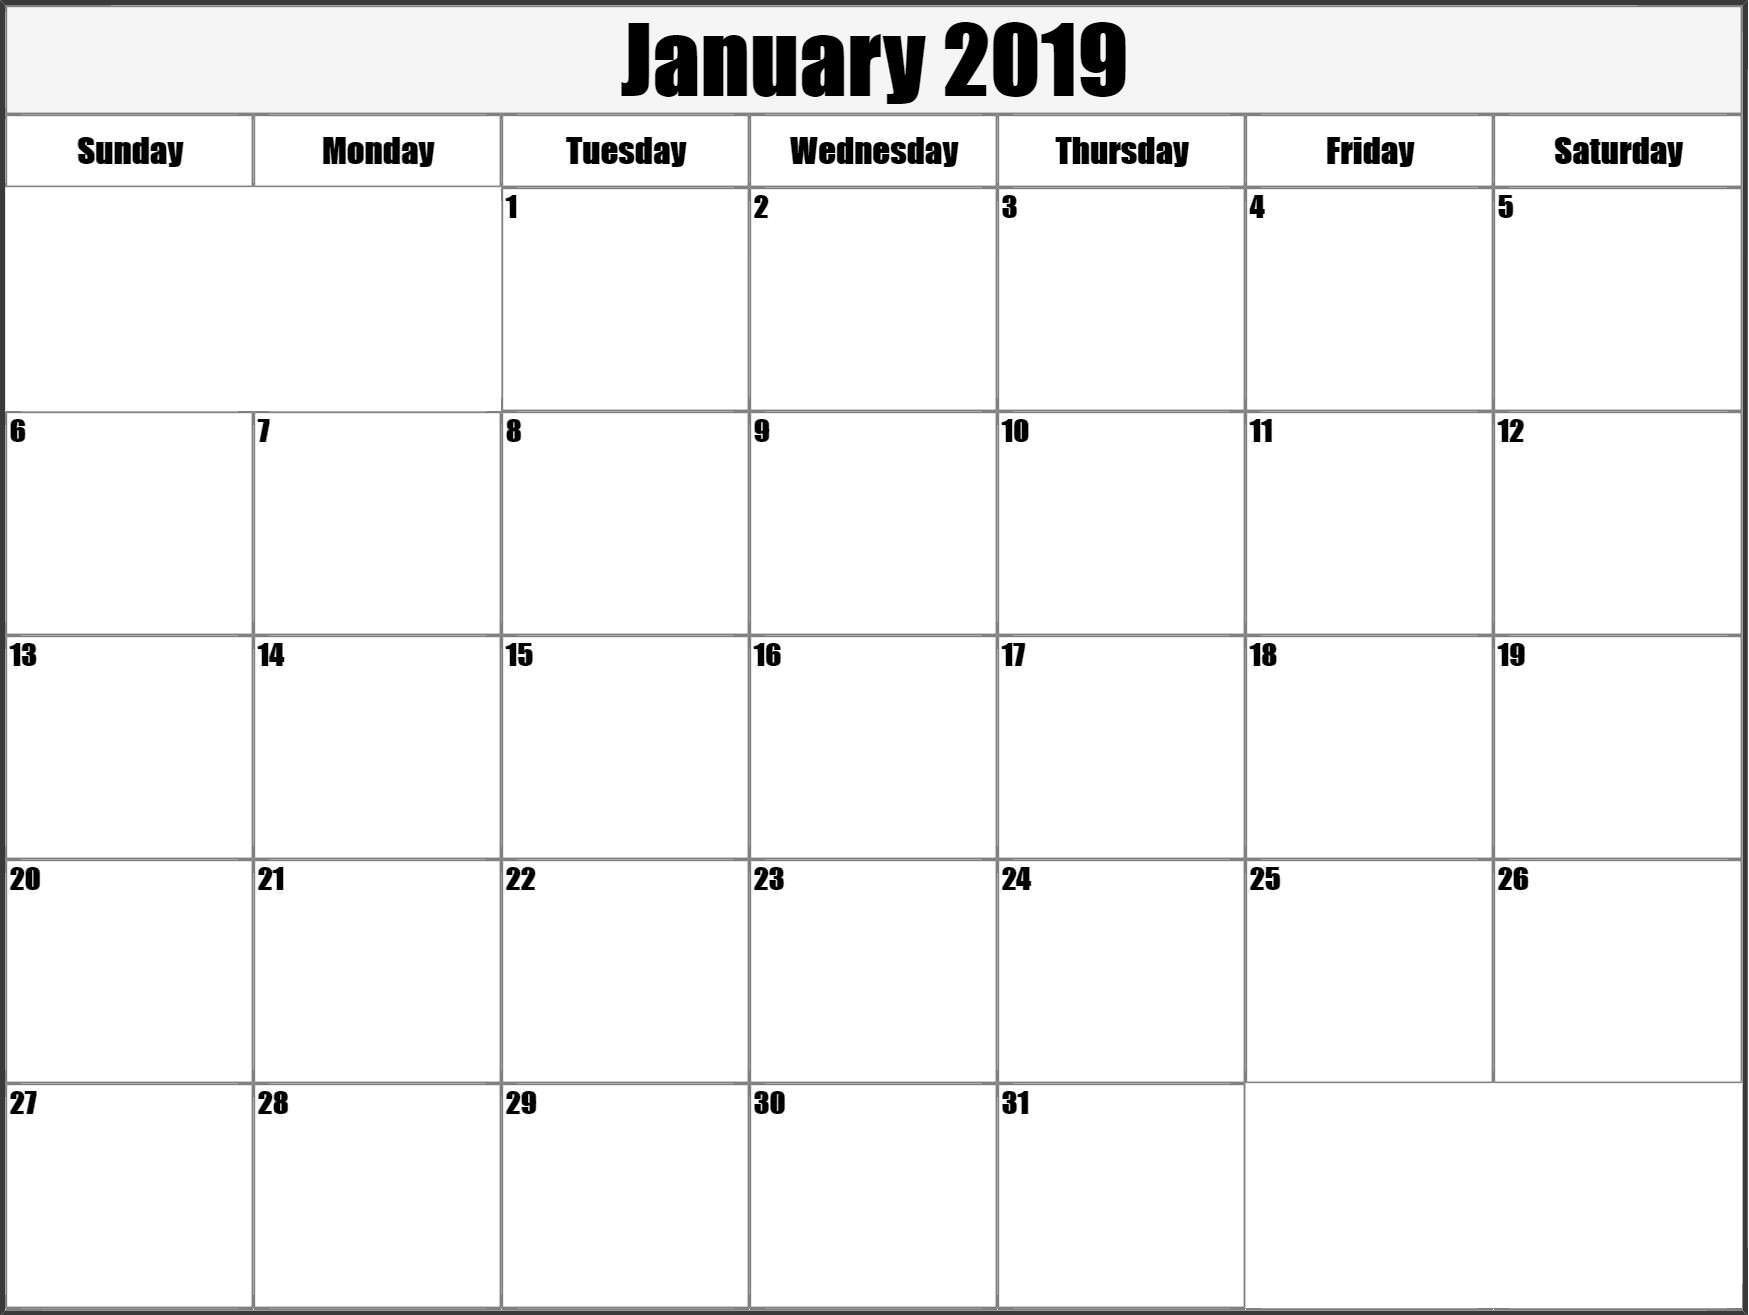 Calendar January 2019 Printable Large | Calendar 2019